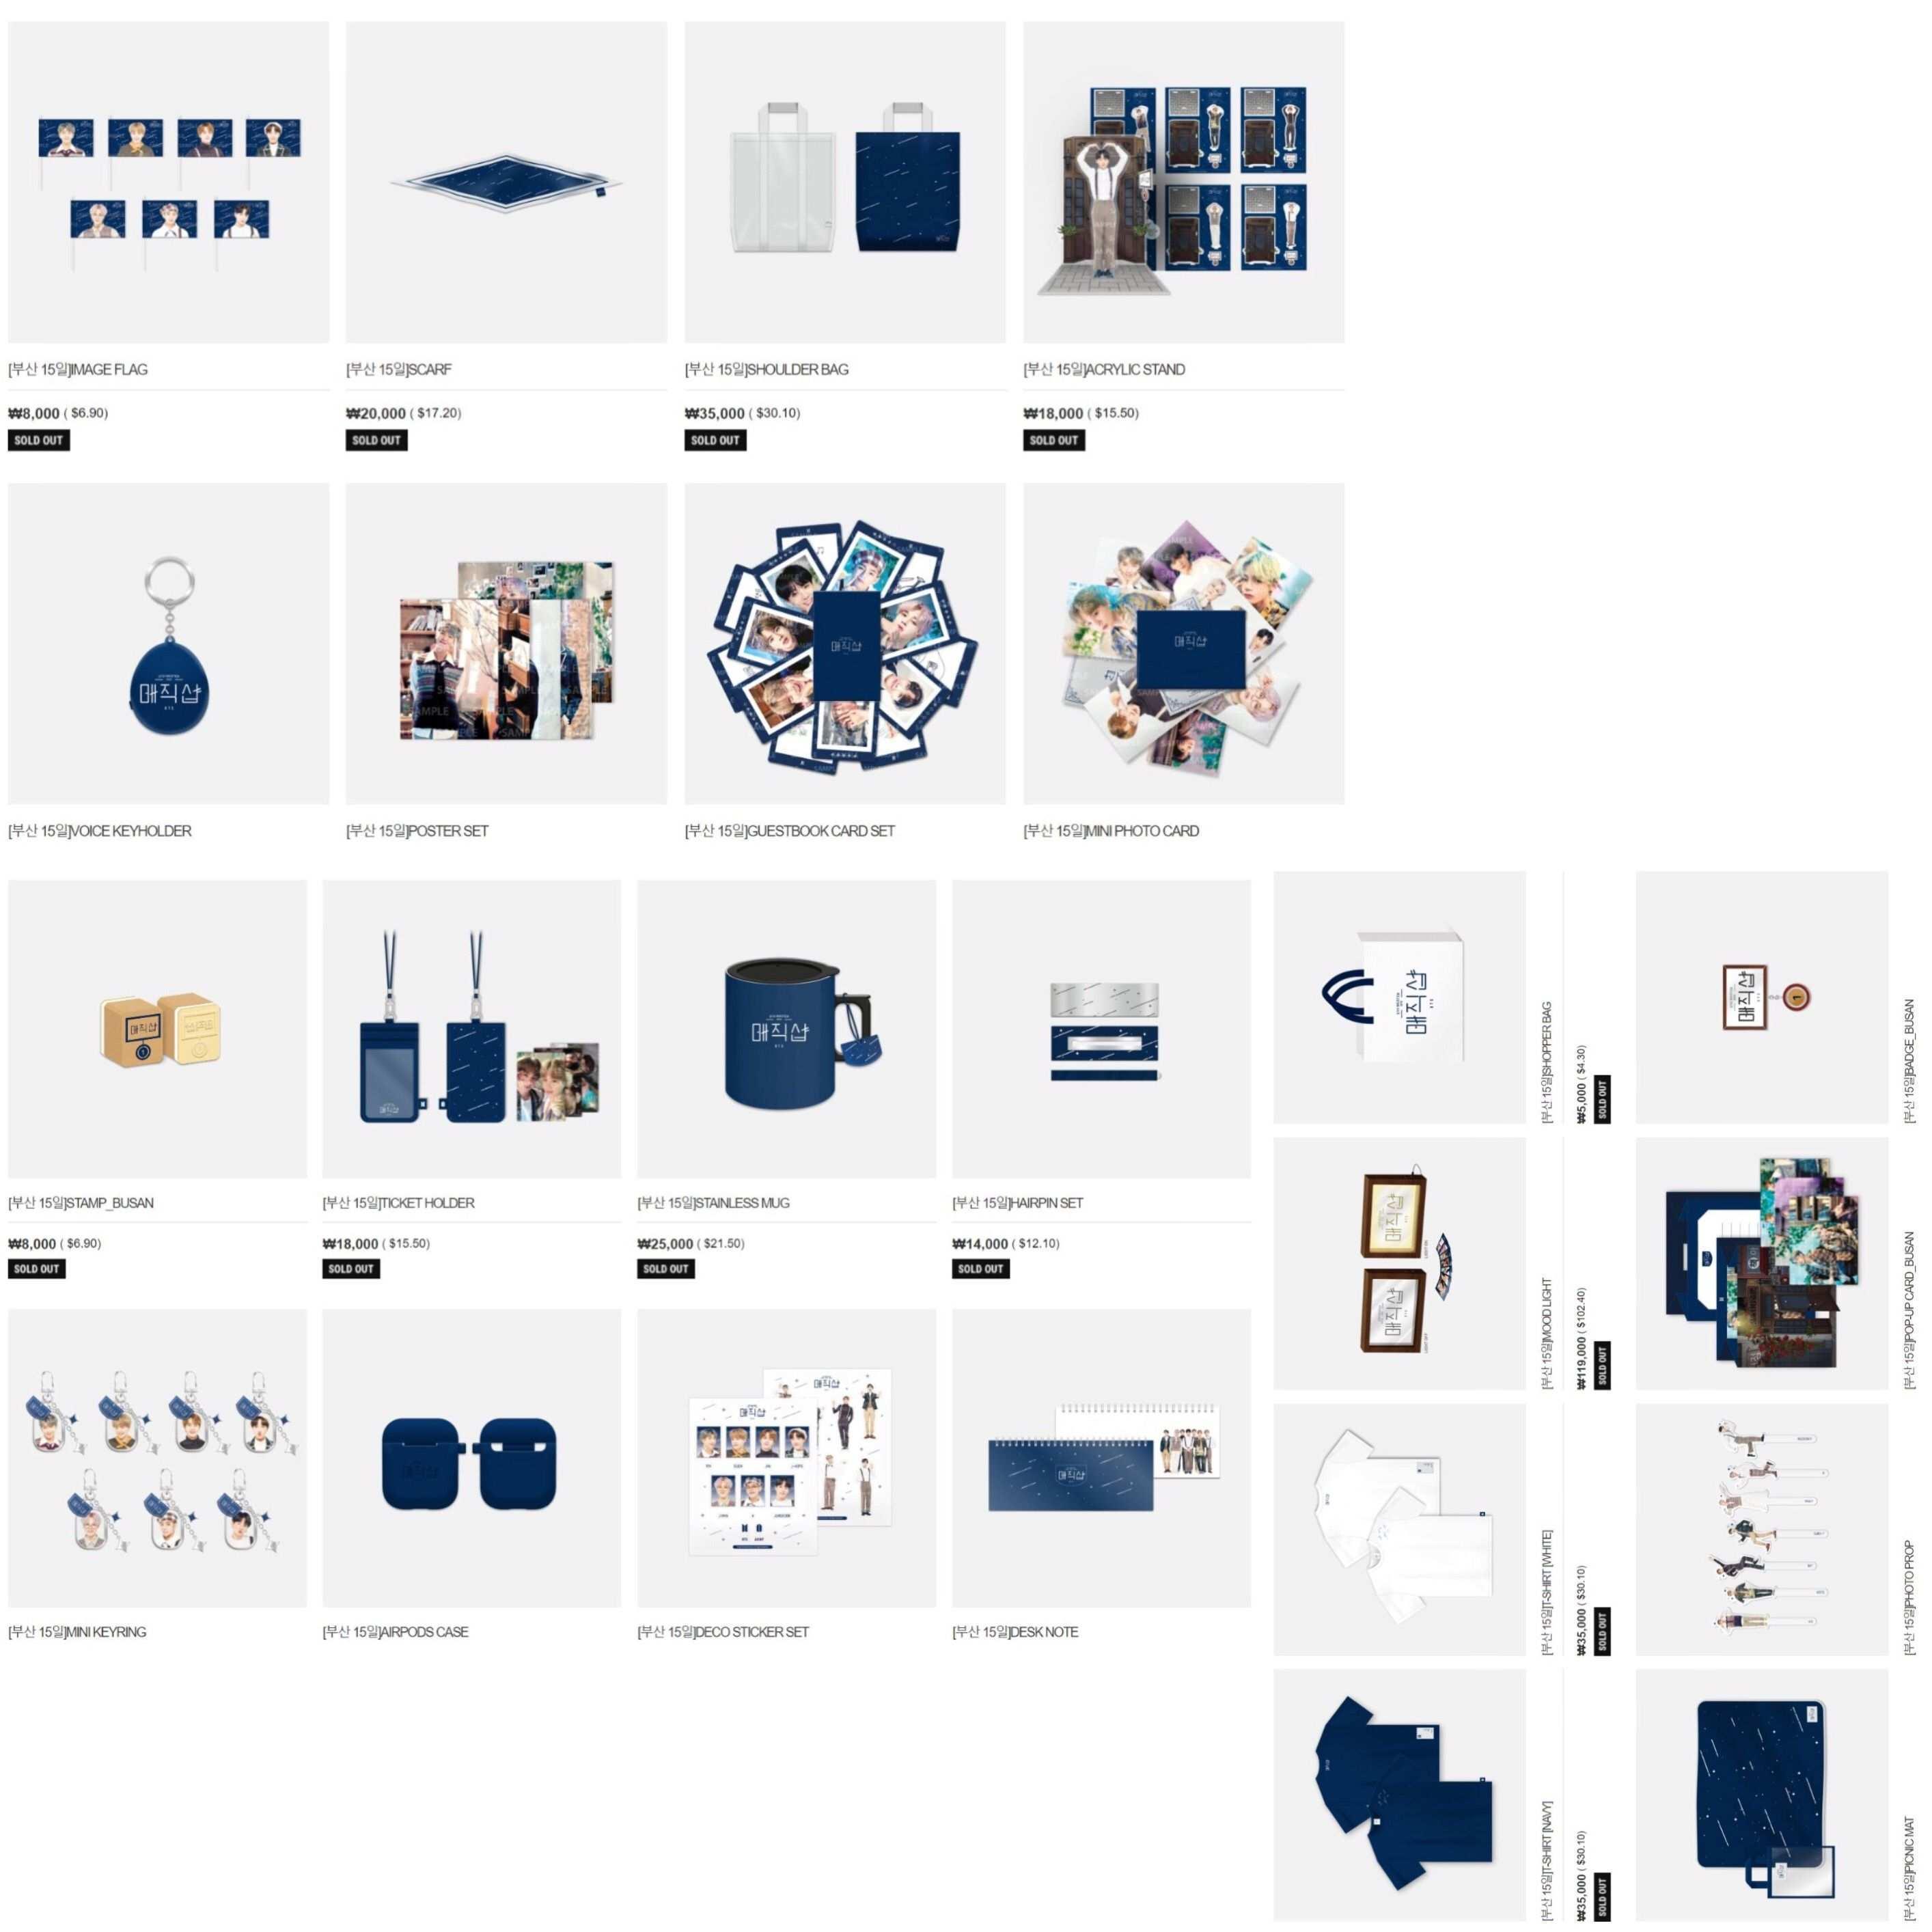 Bts 5th Muster Magic Shop Official Merch List